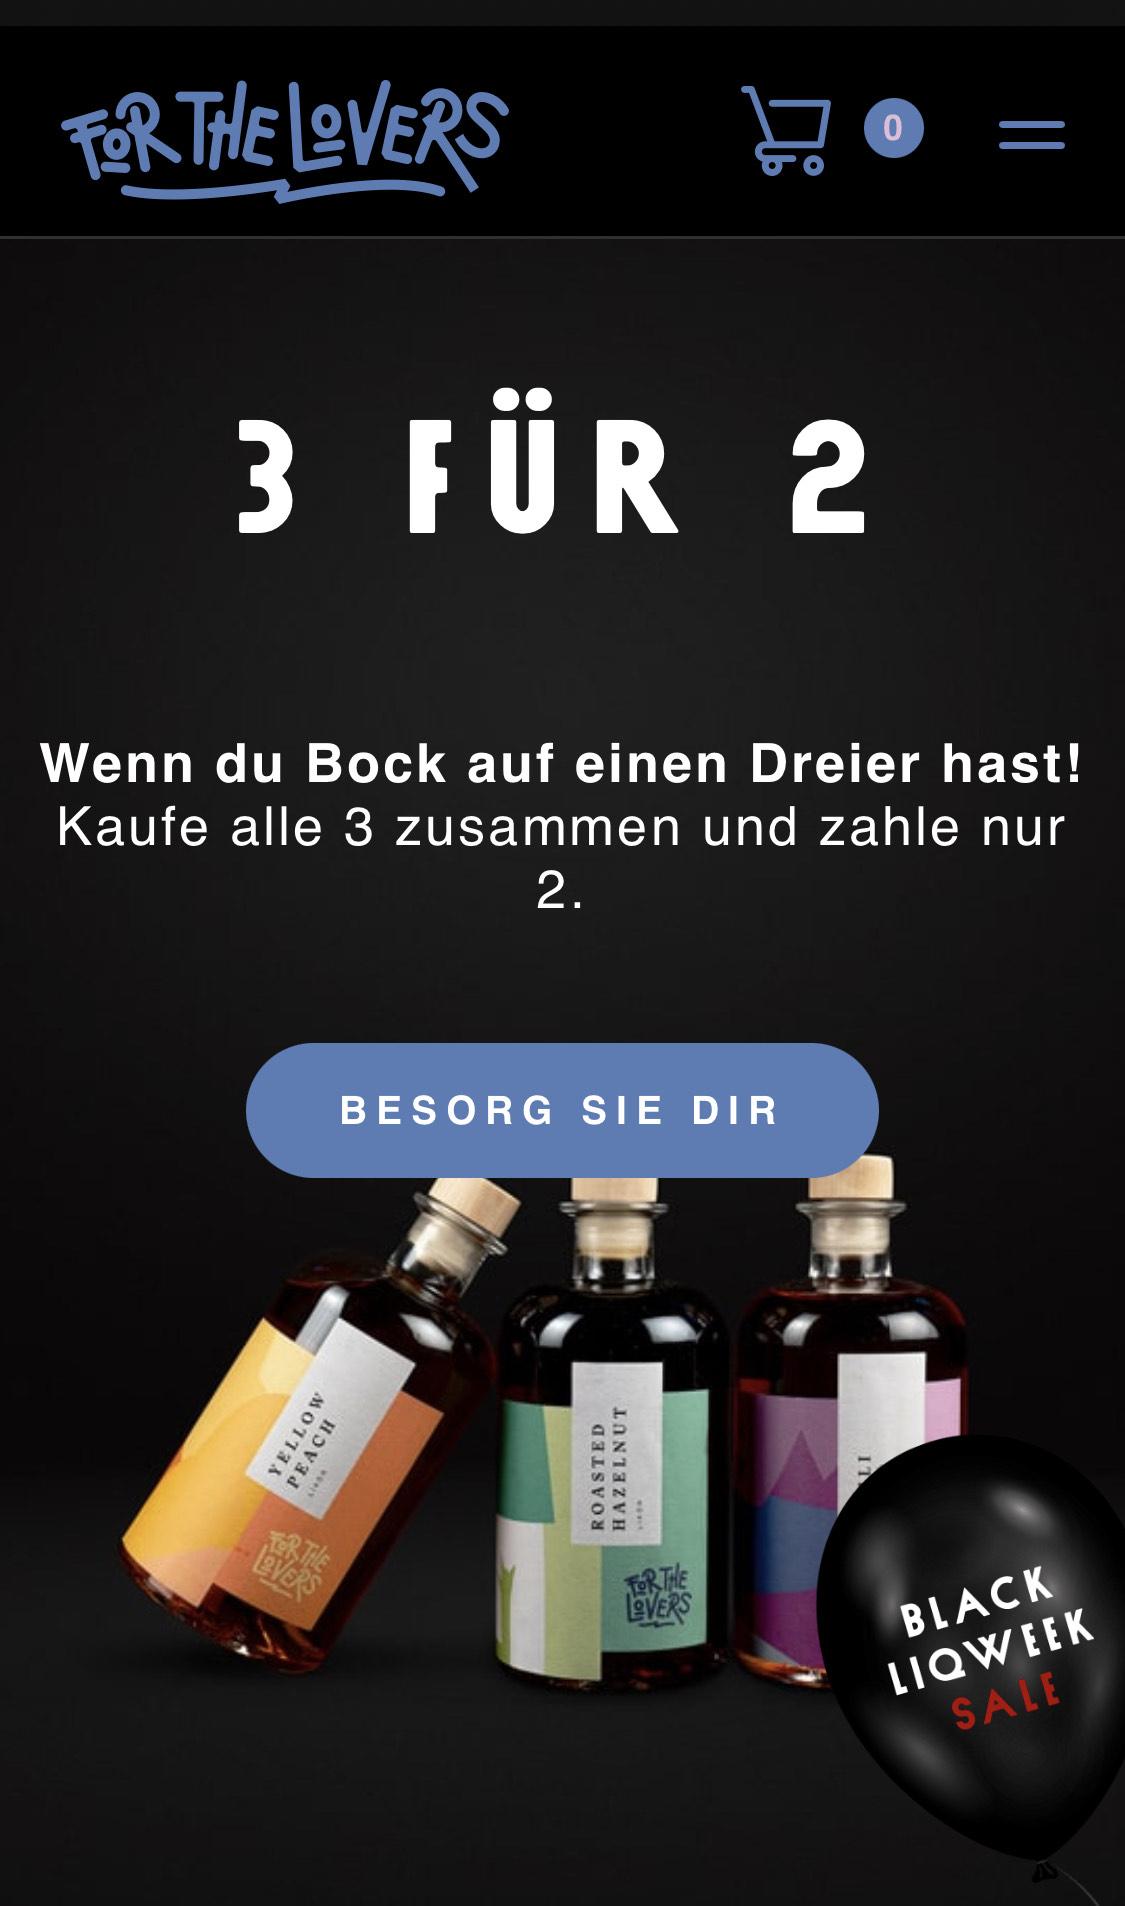 Leckerer Likör im Black Liqweek Sale 3 für 2 à 0,5l. For The Lovers